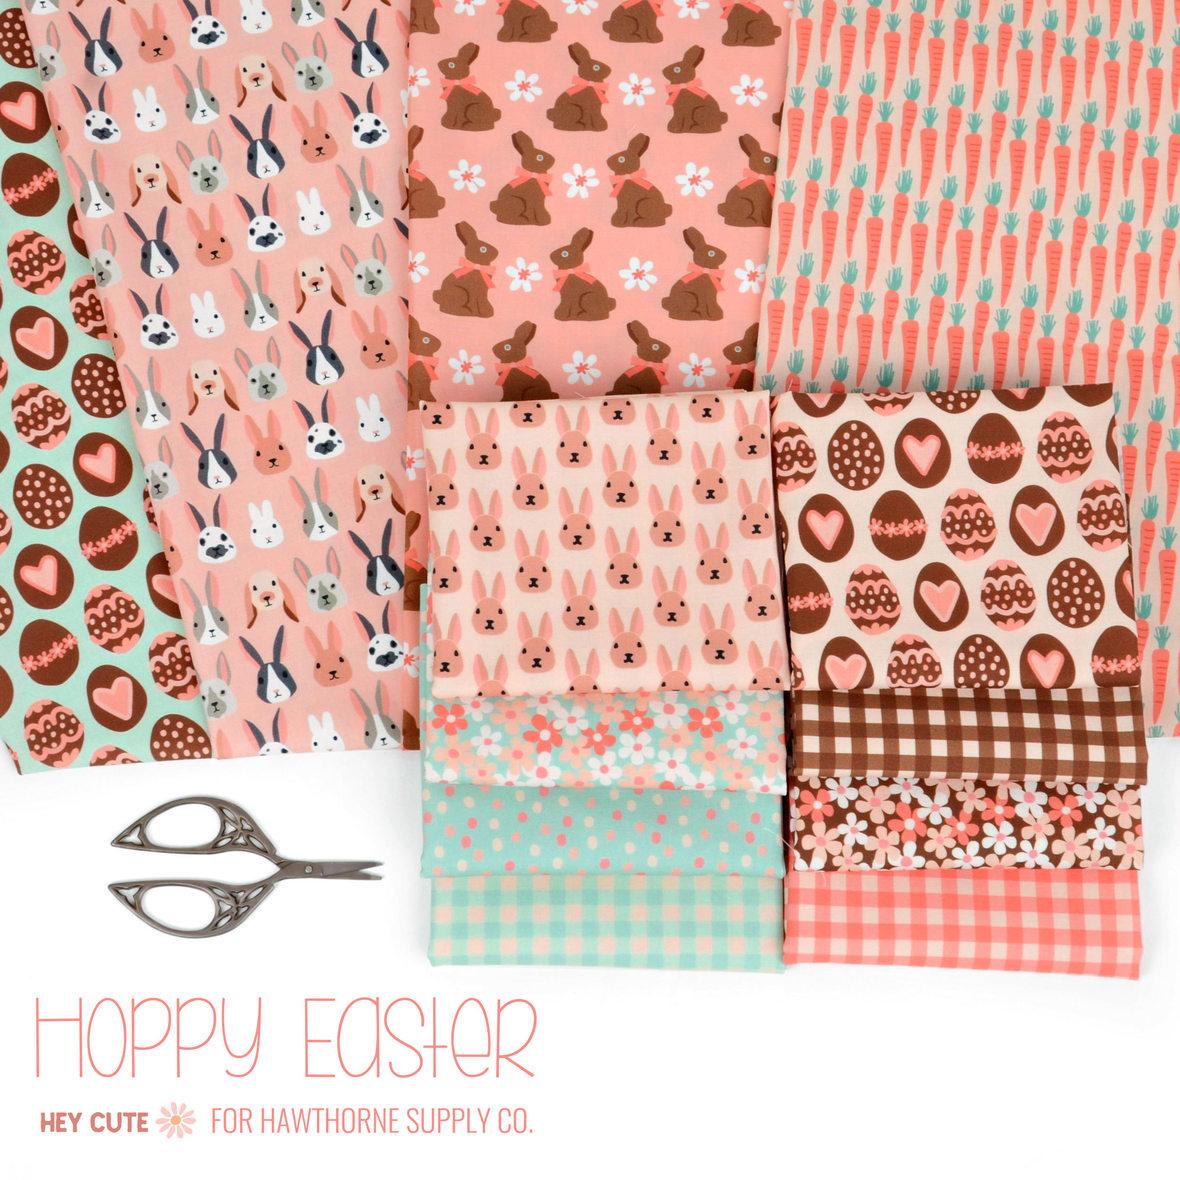 Hoppy-Easter-Bunny-Fabric-Hey-Cute-Design-for-Hawthorne-Supply-Co